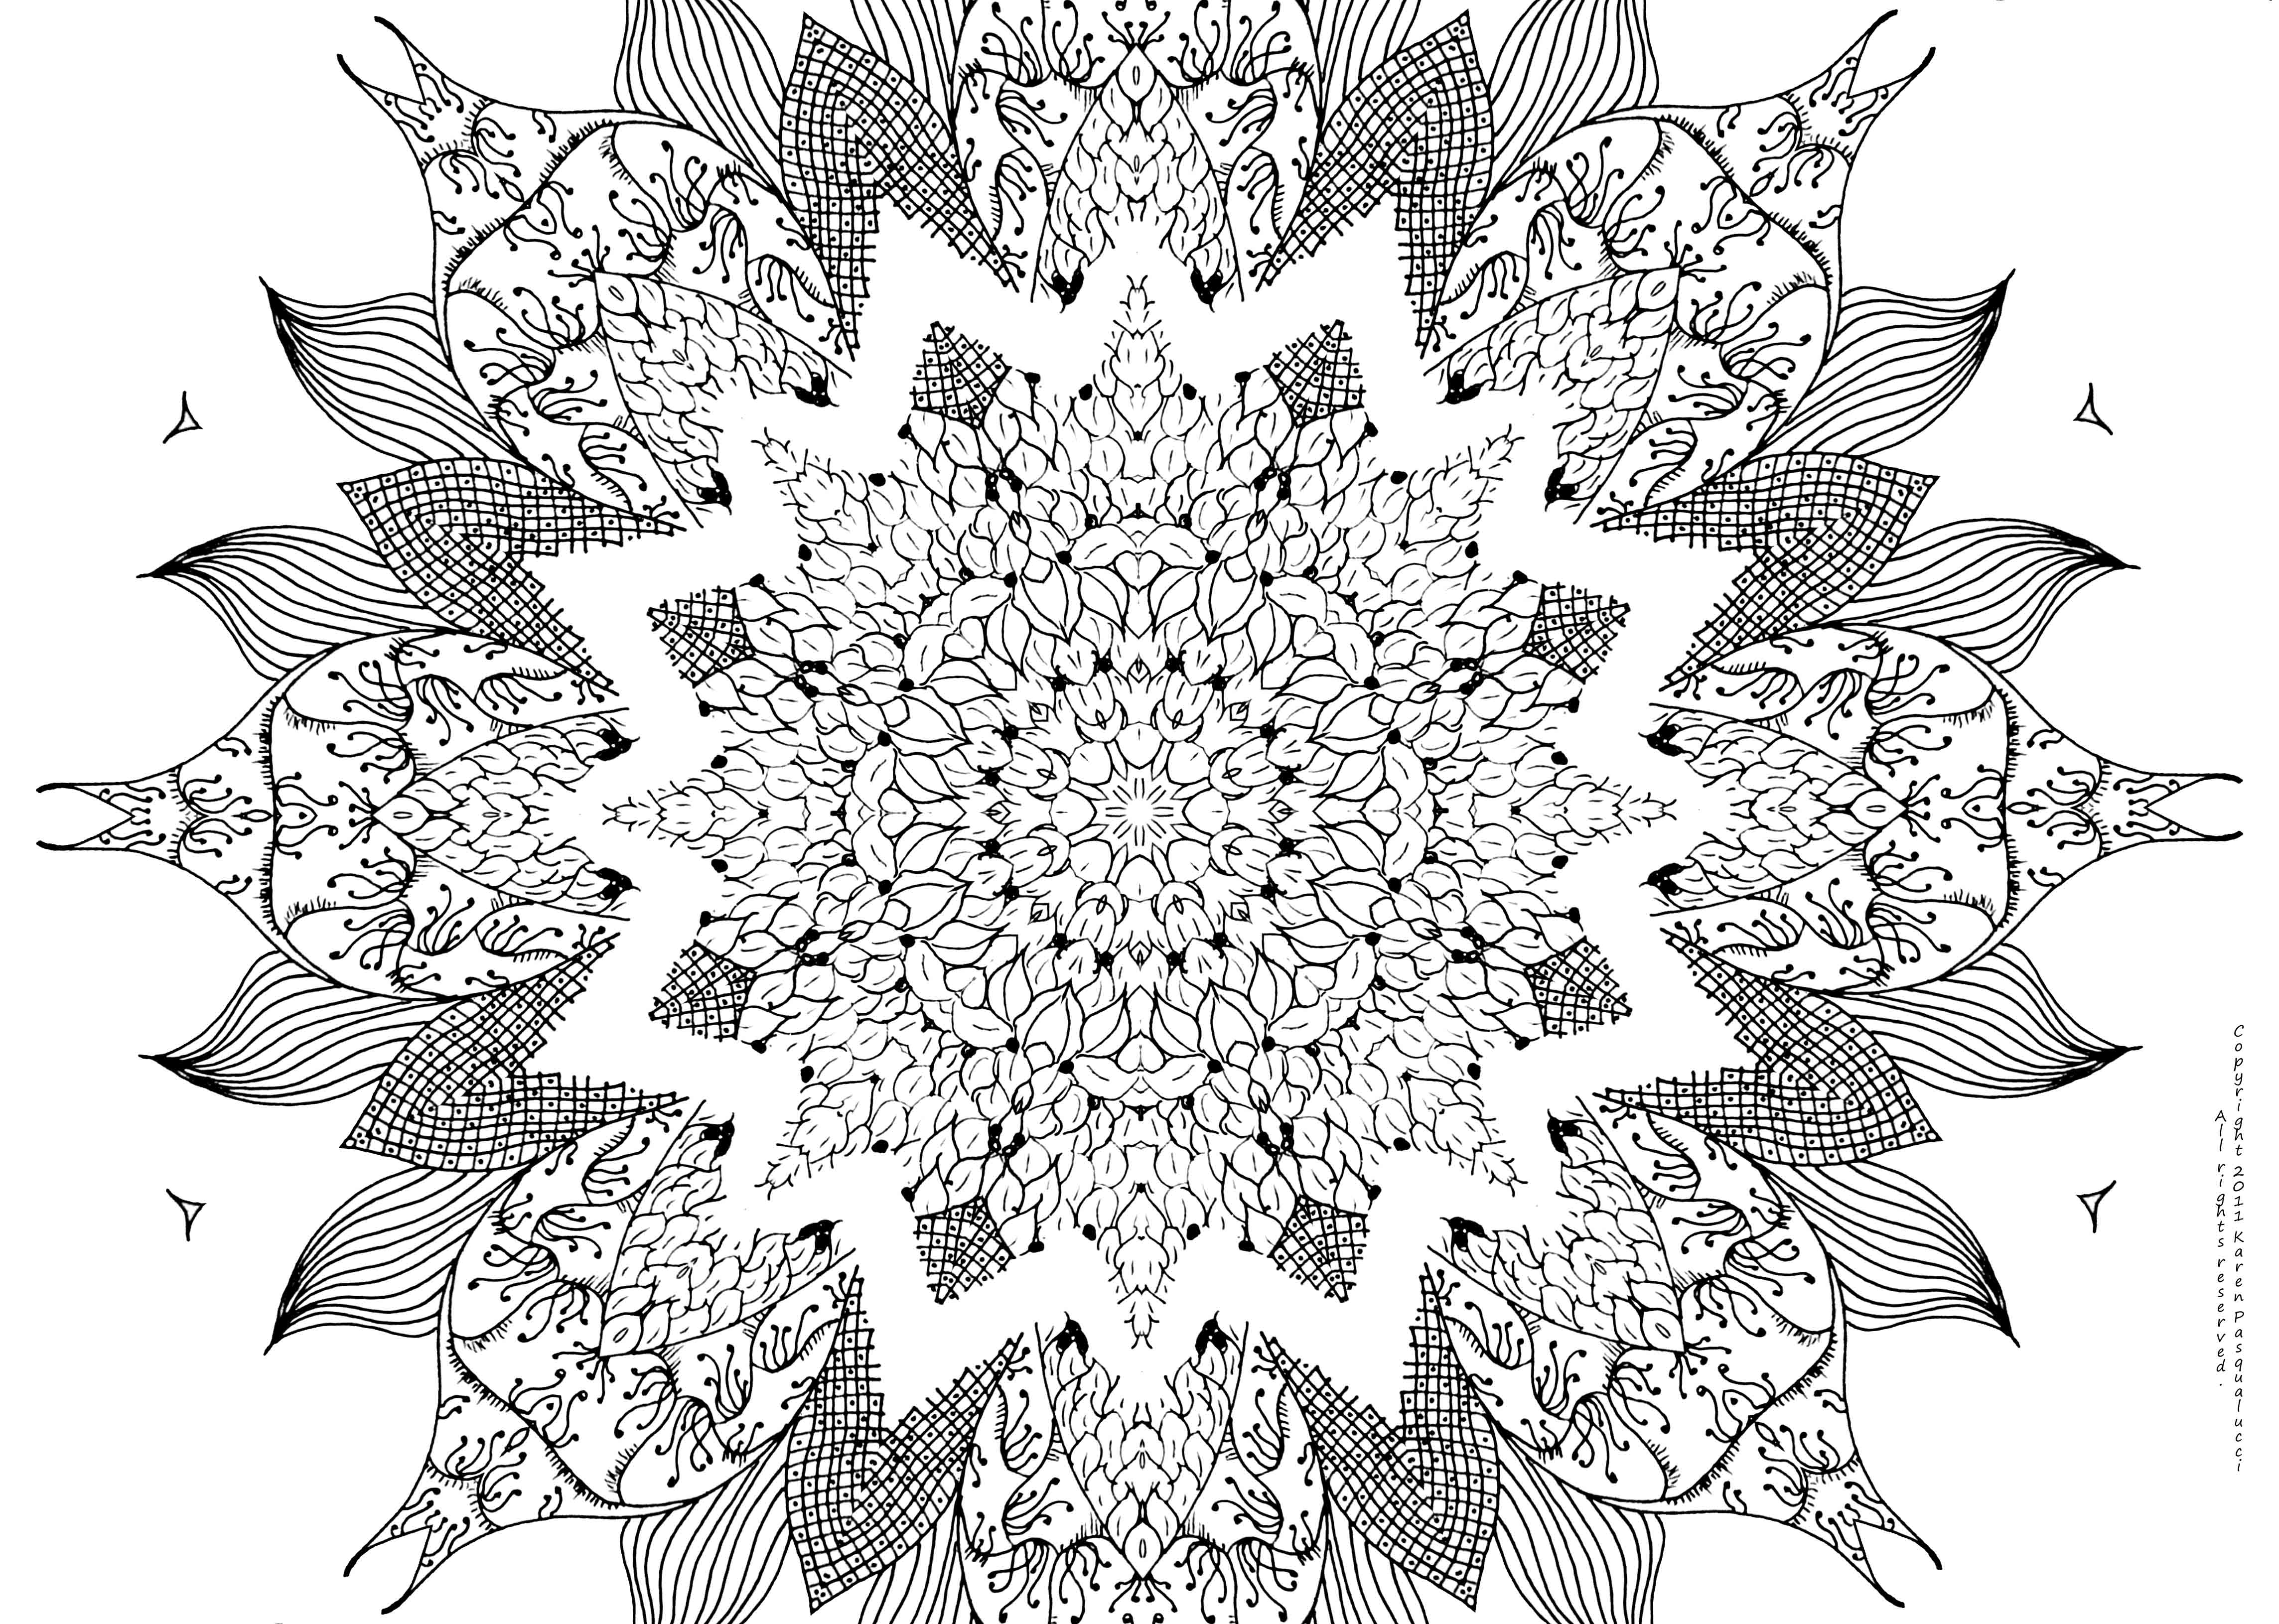 Space mandala coloring pages - Free Mandala Coloring Pages Juliet Voteforverde Com